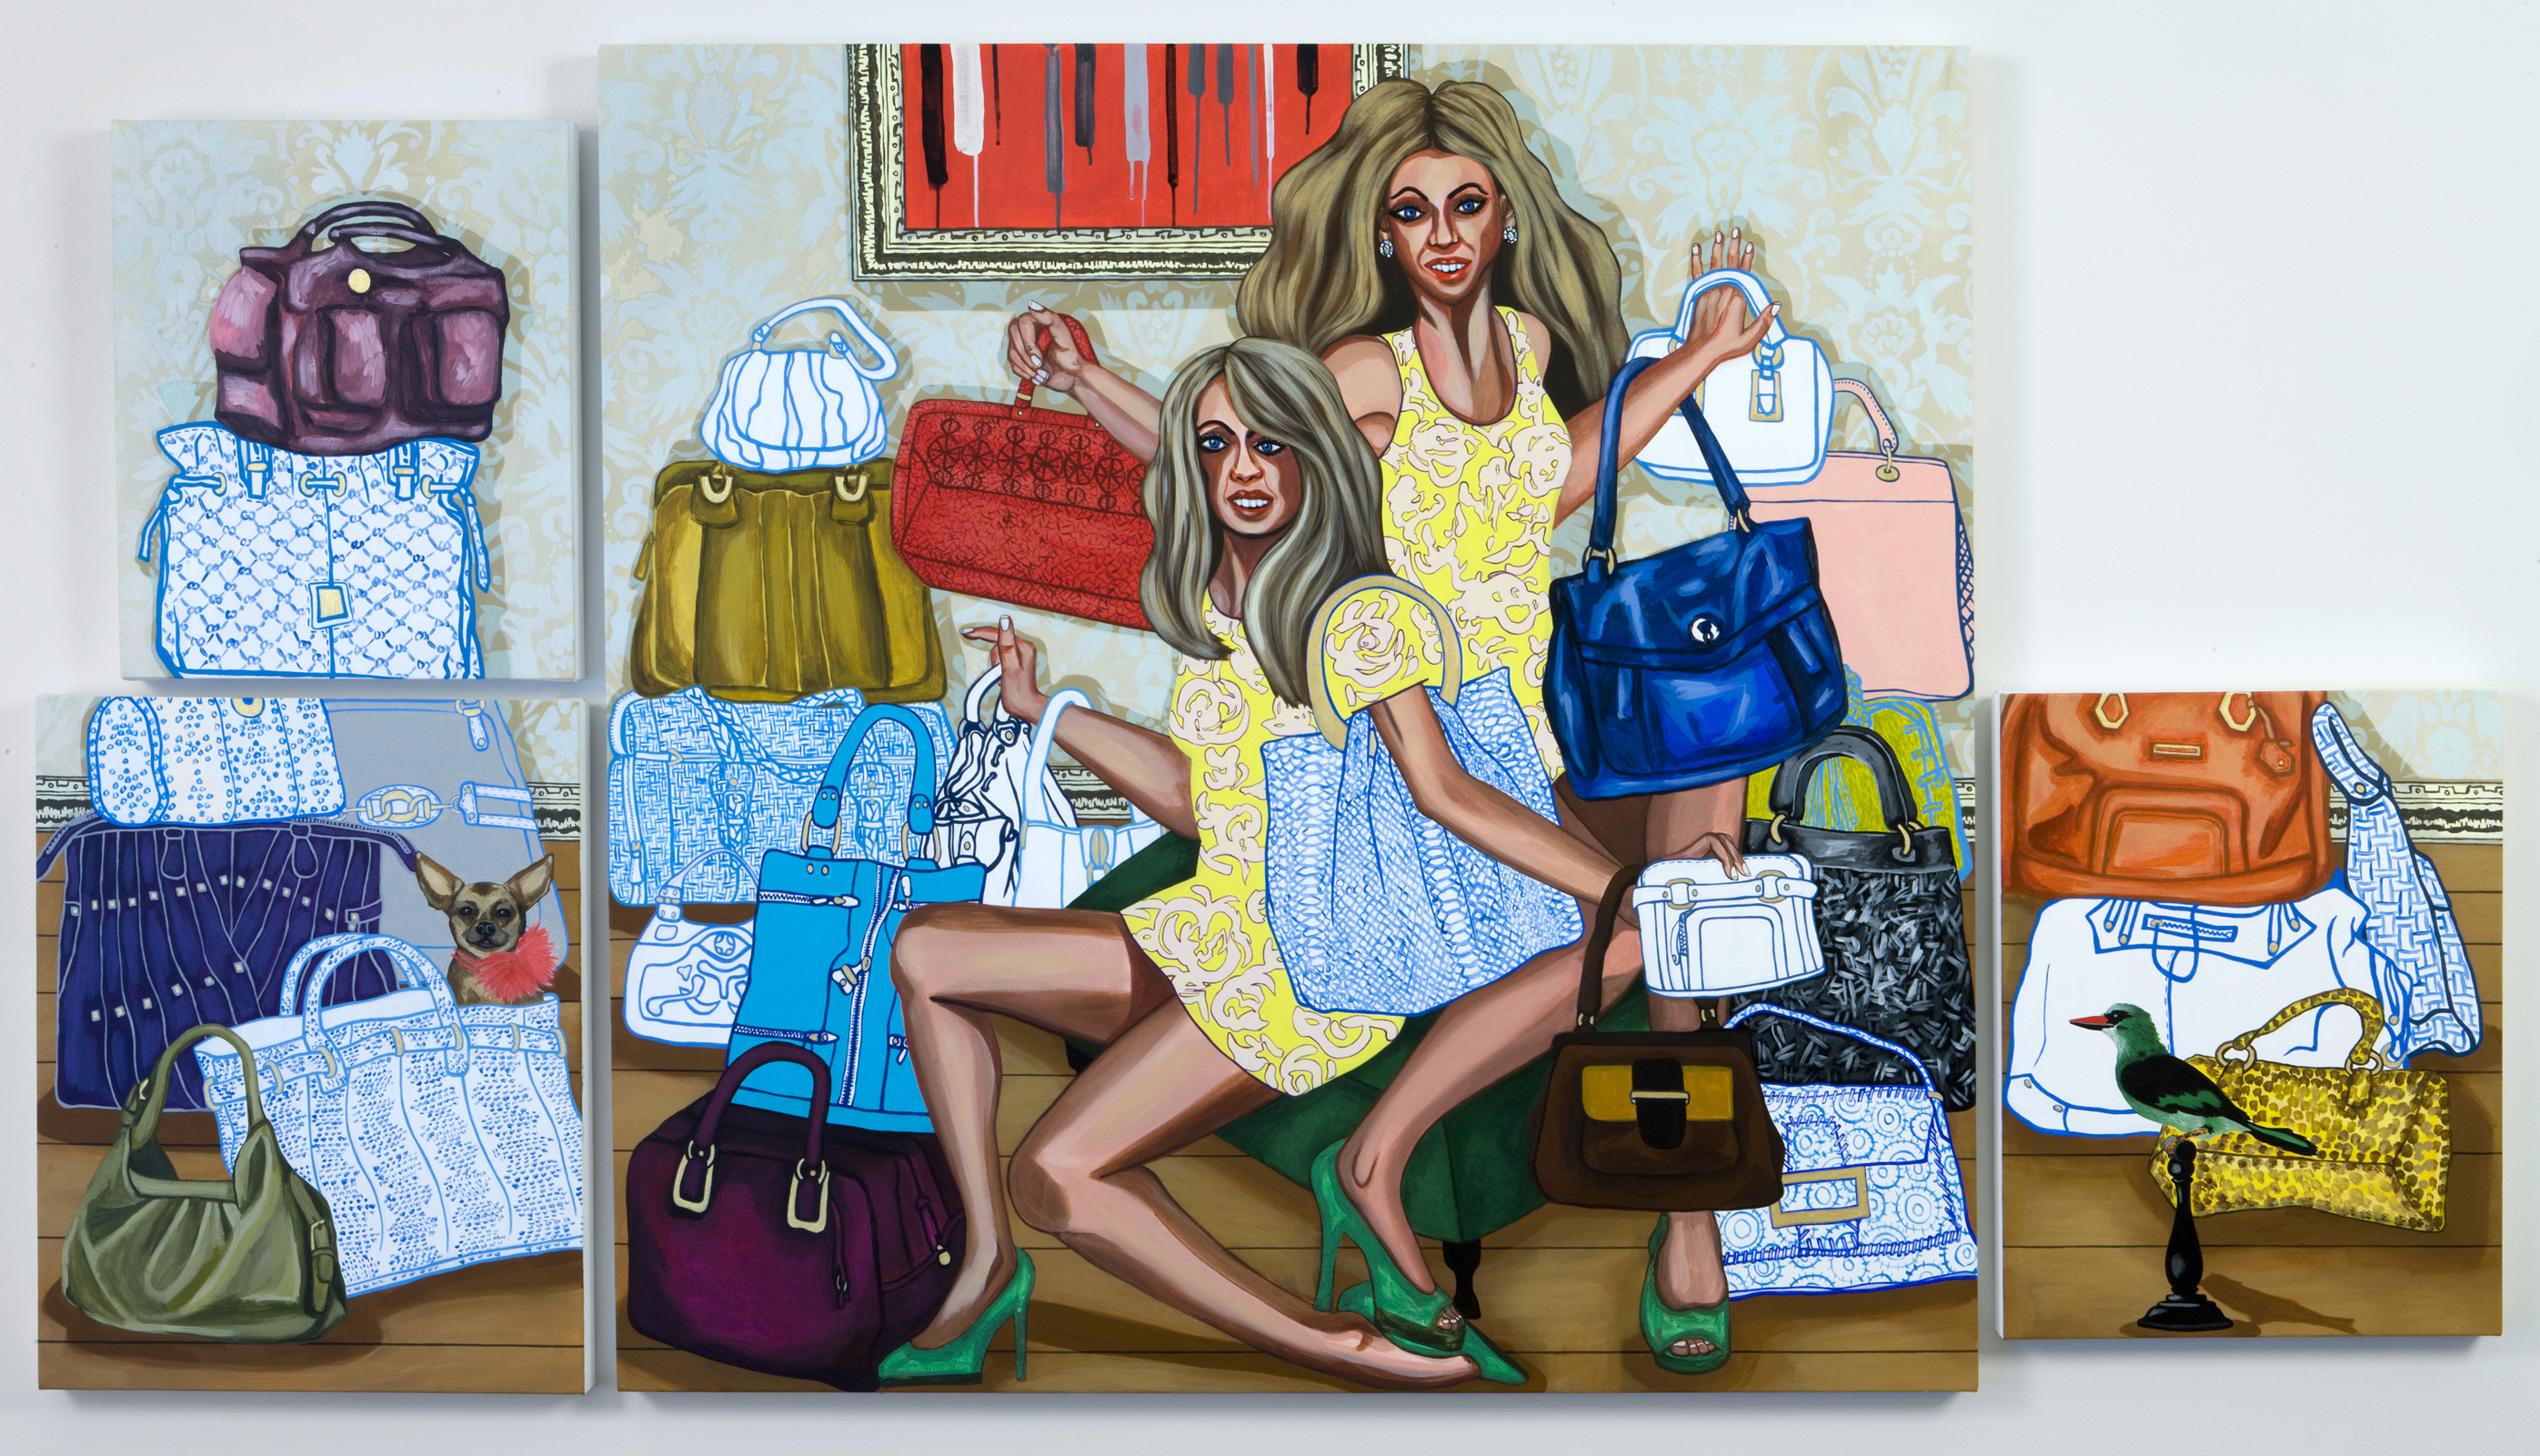 The Shopper, 2008